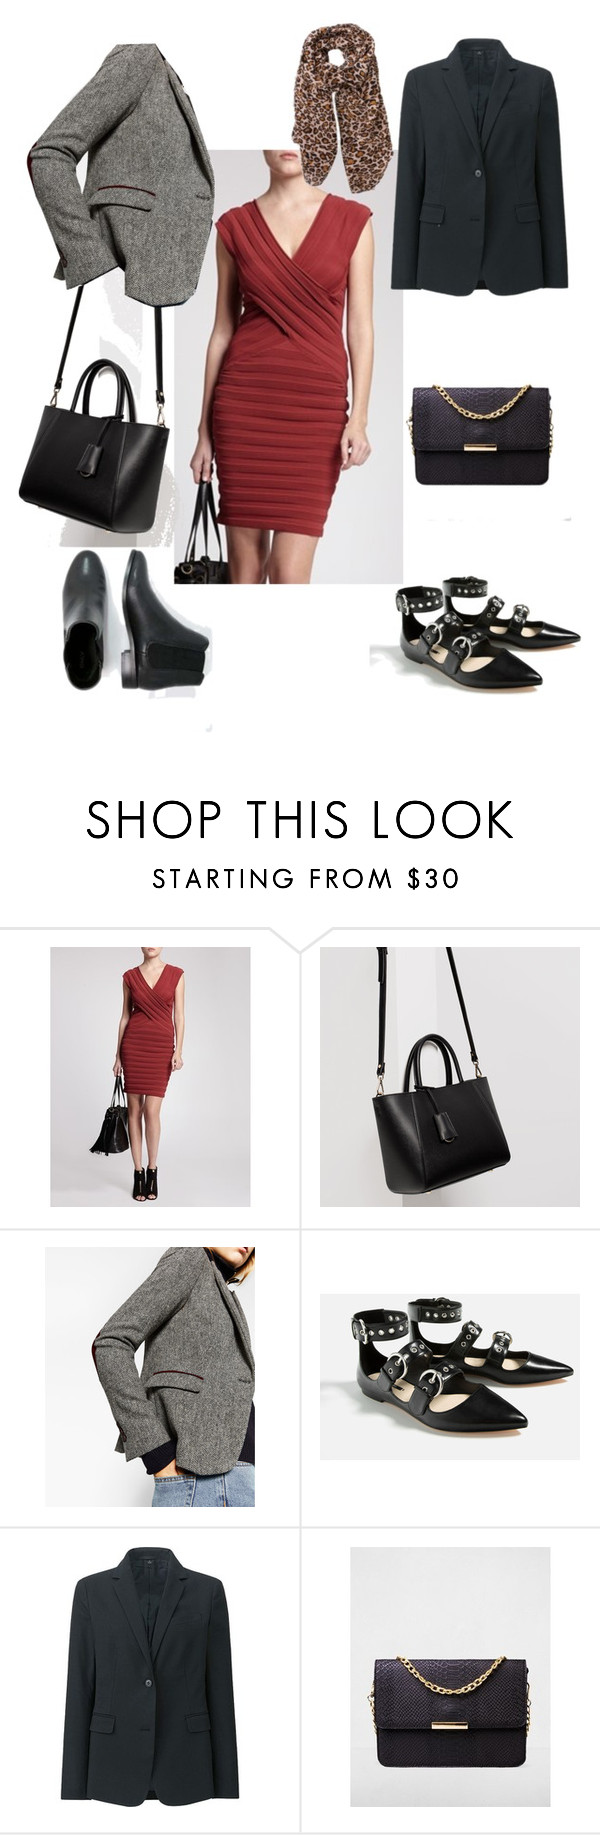 """glamorous modern look"" by valeriaviero on Polyvore featuring moda, Belgique e modern"